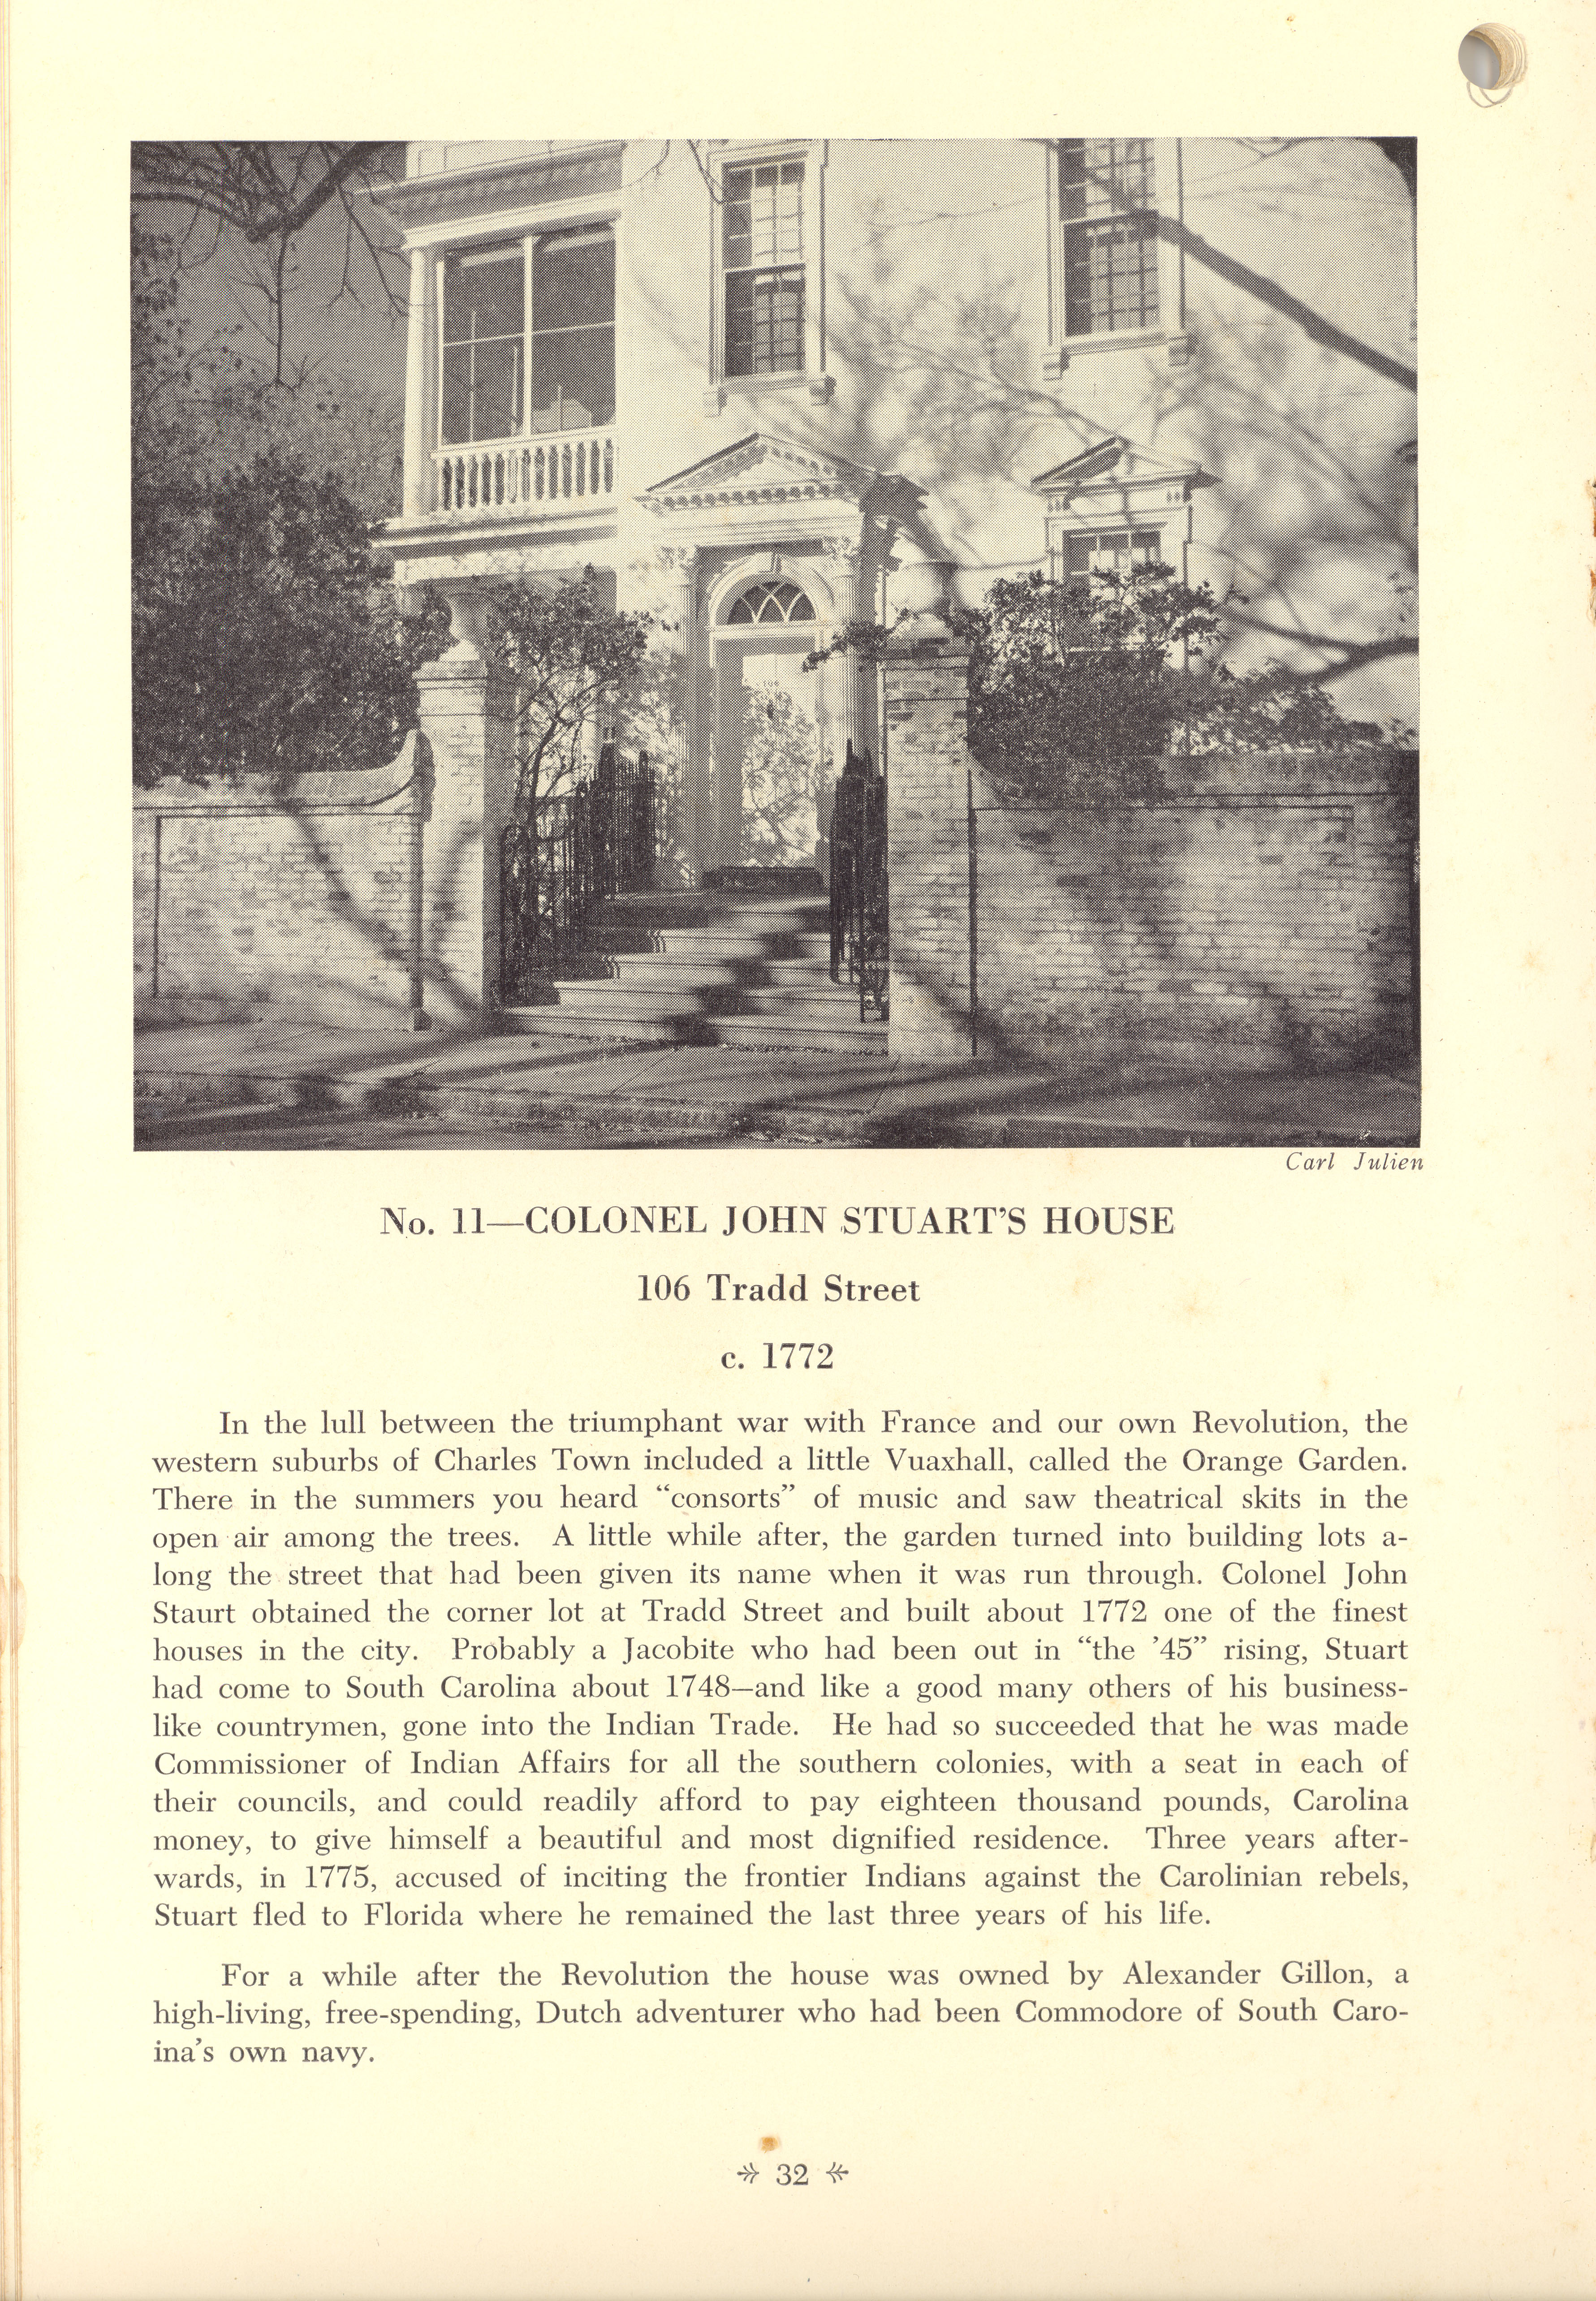 Page 32:  No. 11 - Colonel John Stuart's House, 106 Tradd Street, c. 1772